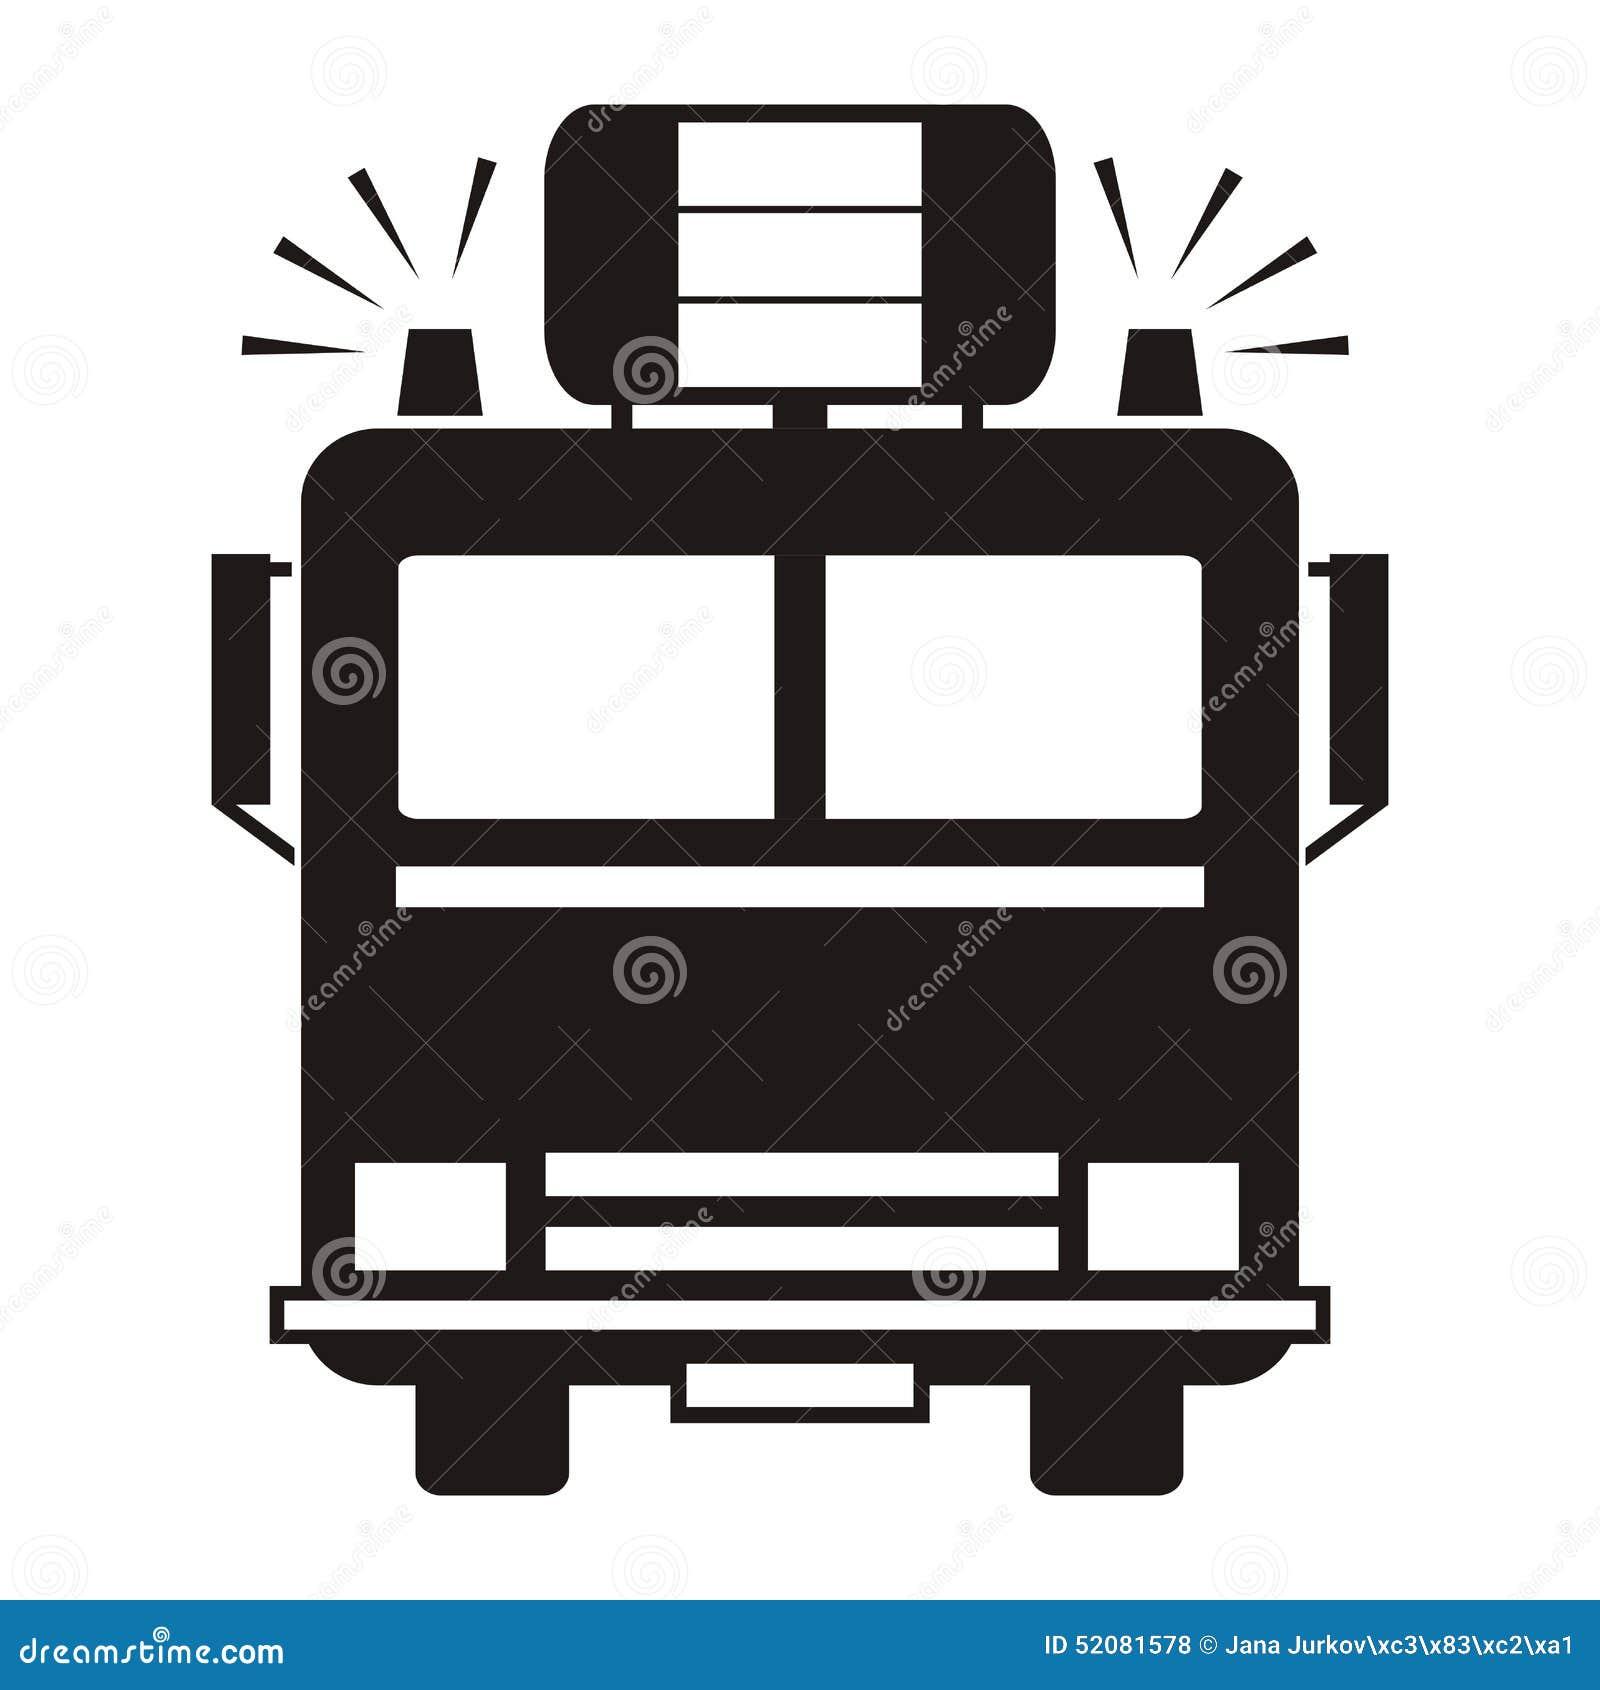 fire truck black silhouette stock vector image 52081578